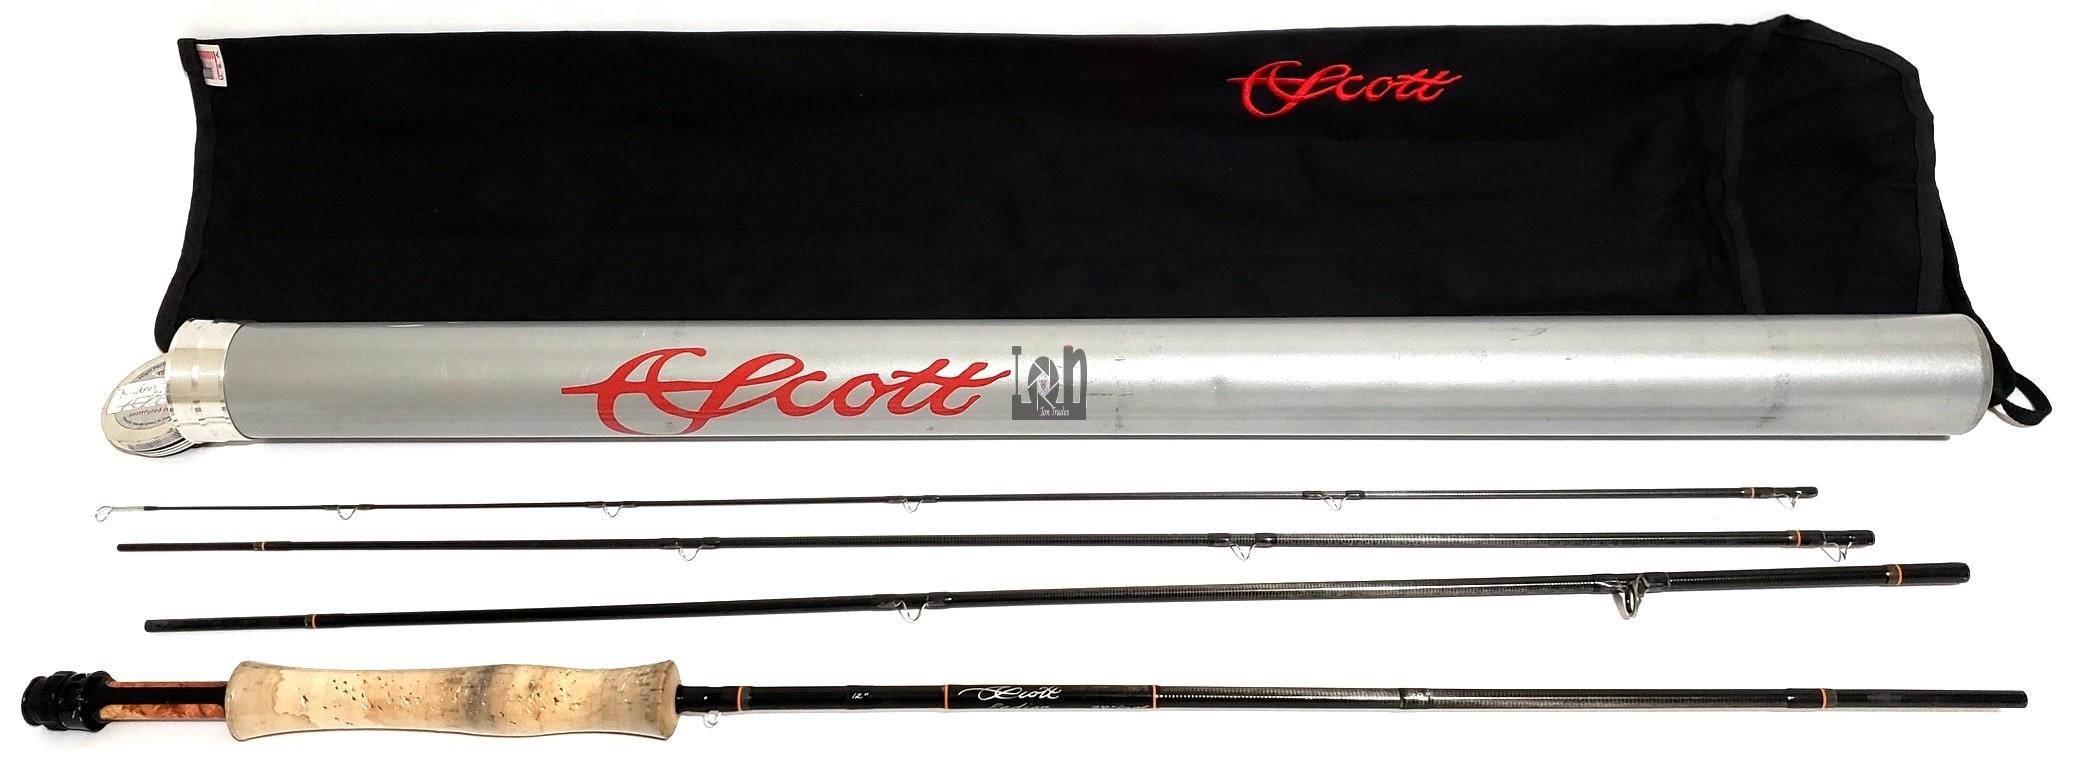 Scott Radian 9' 6 Line  Fly Rod